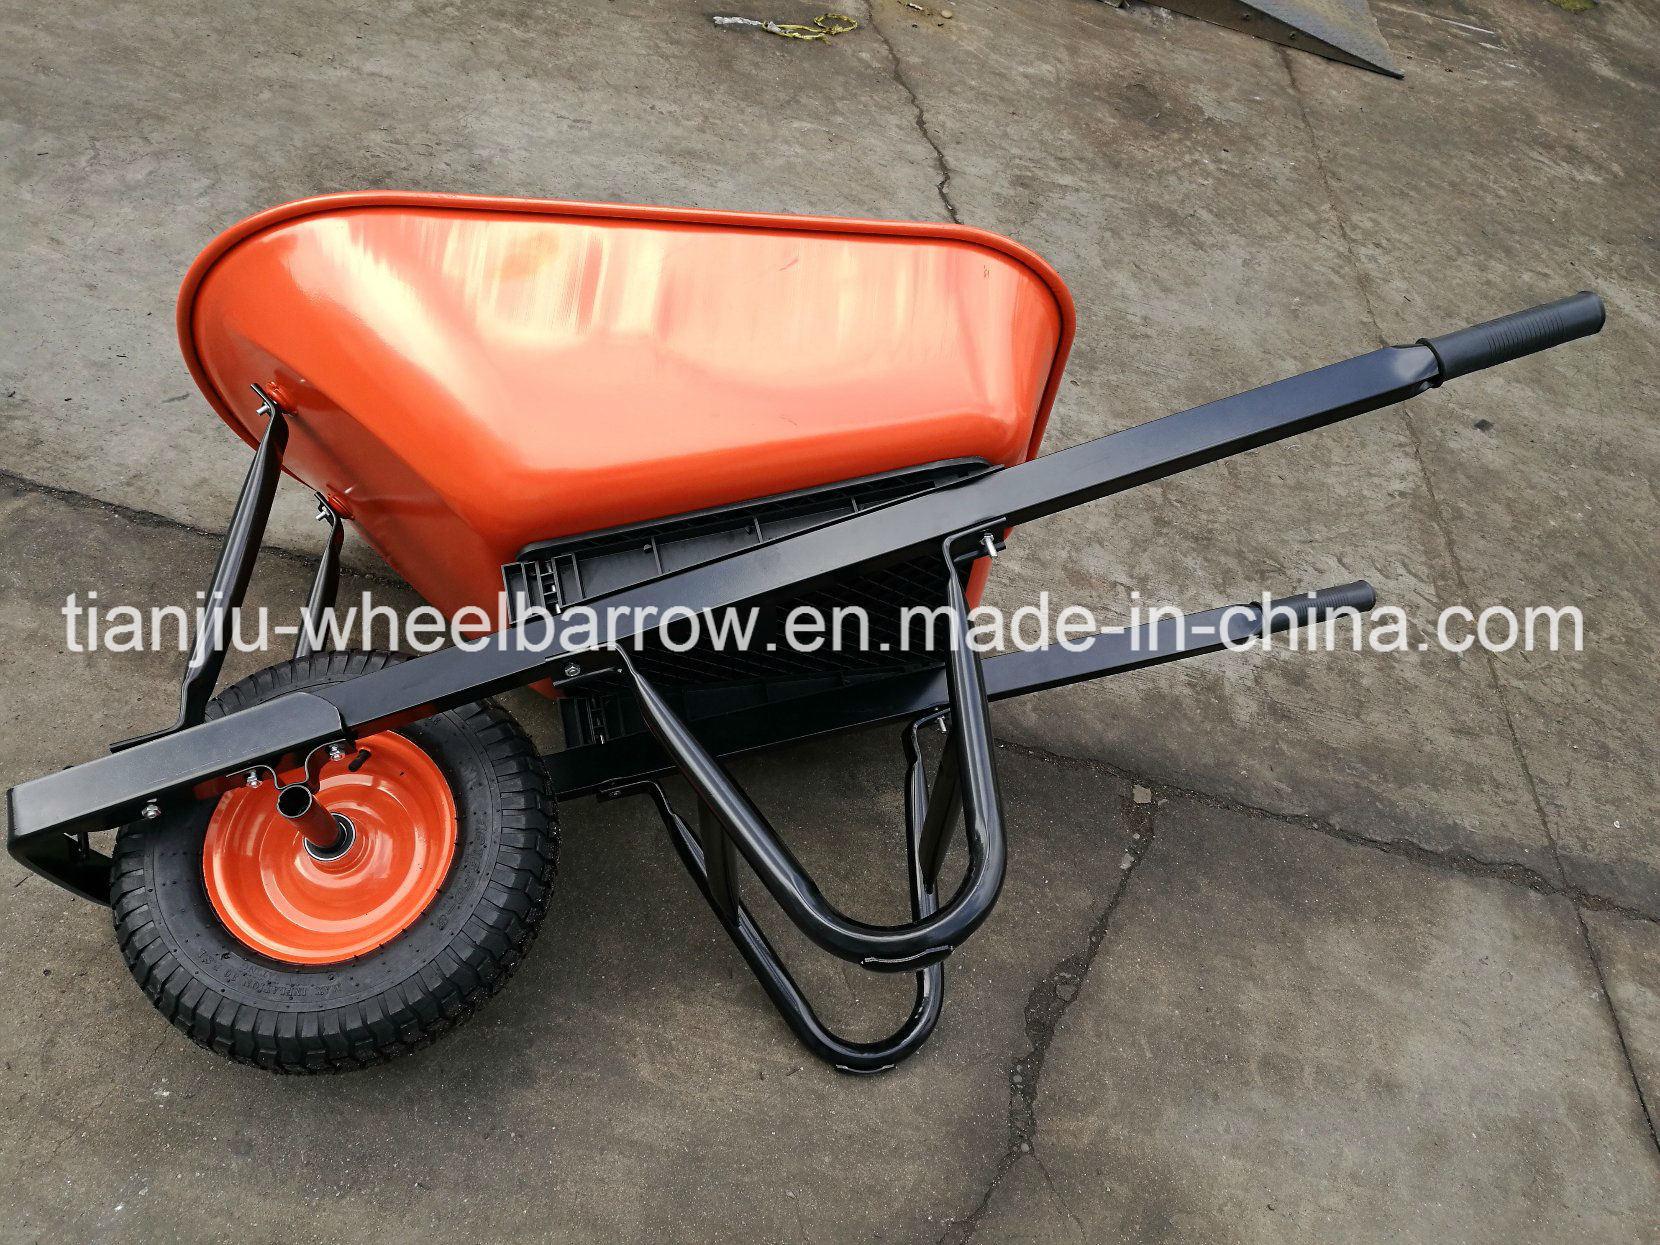 Square Handle for Wheelbarrow/Wheel Barrow Wb8601